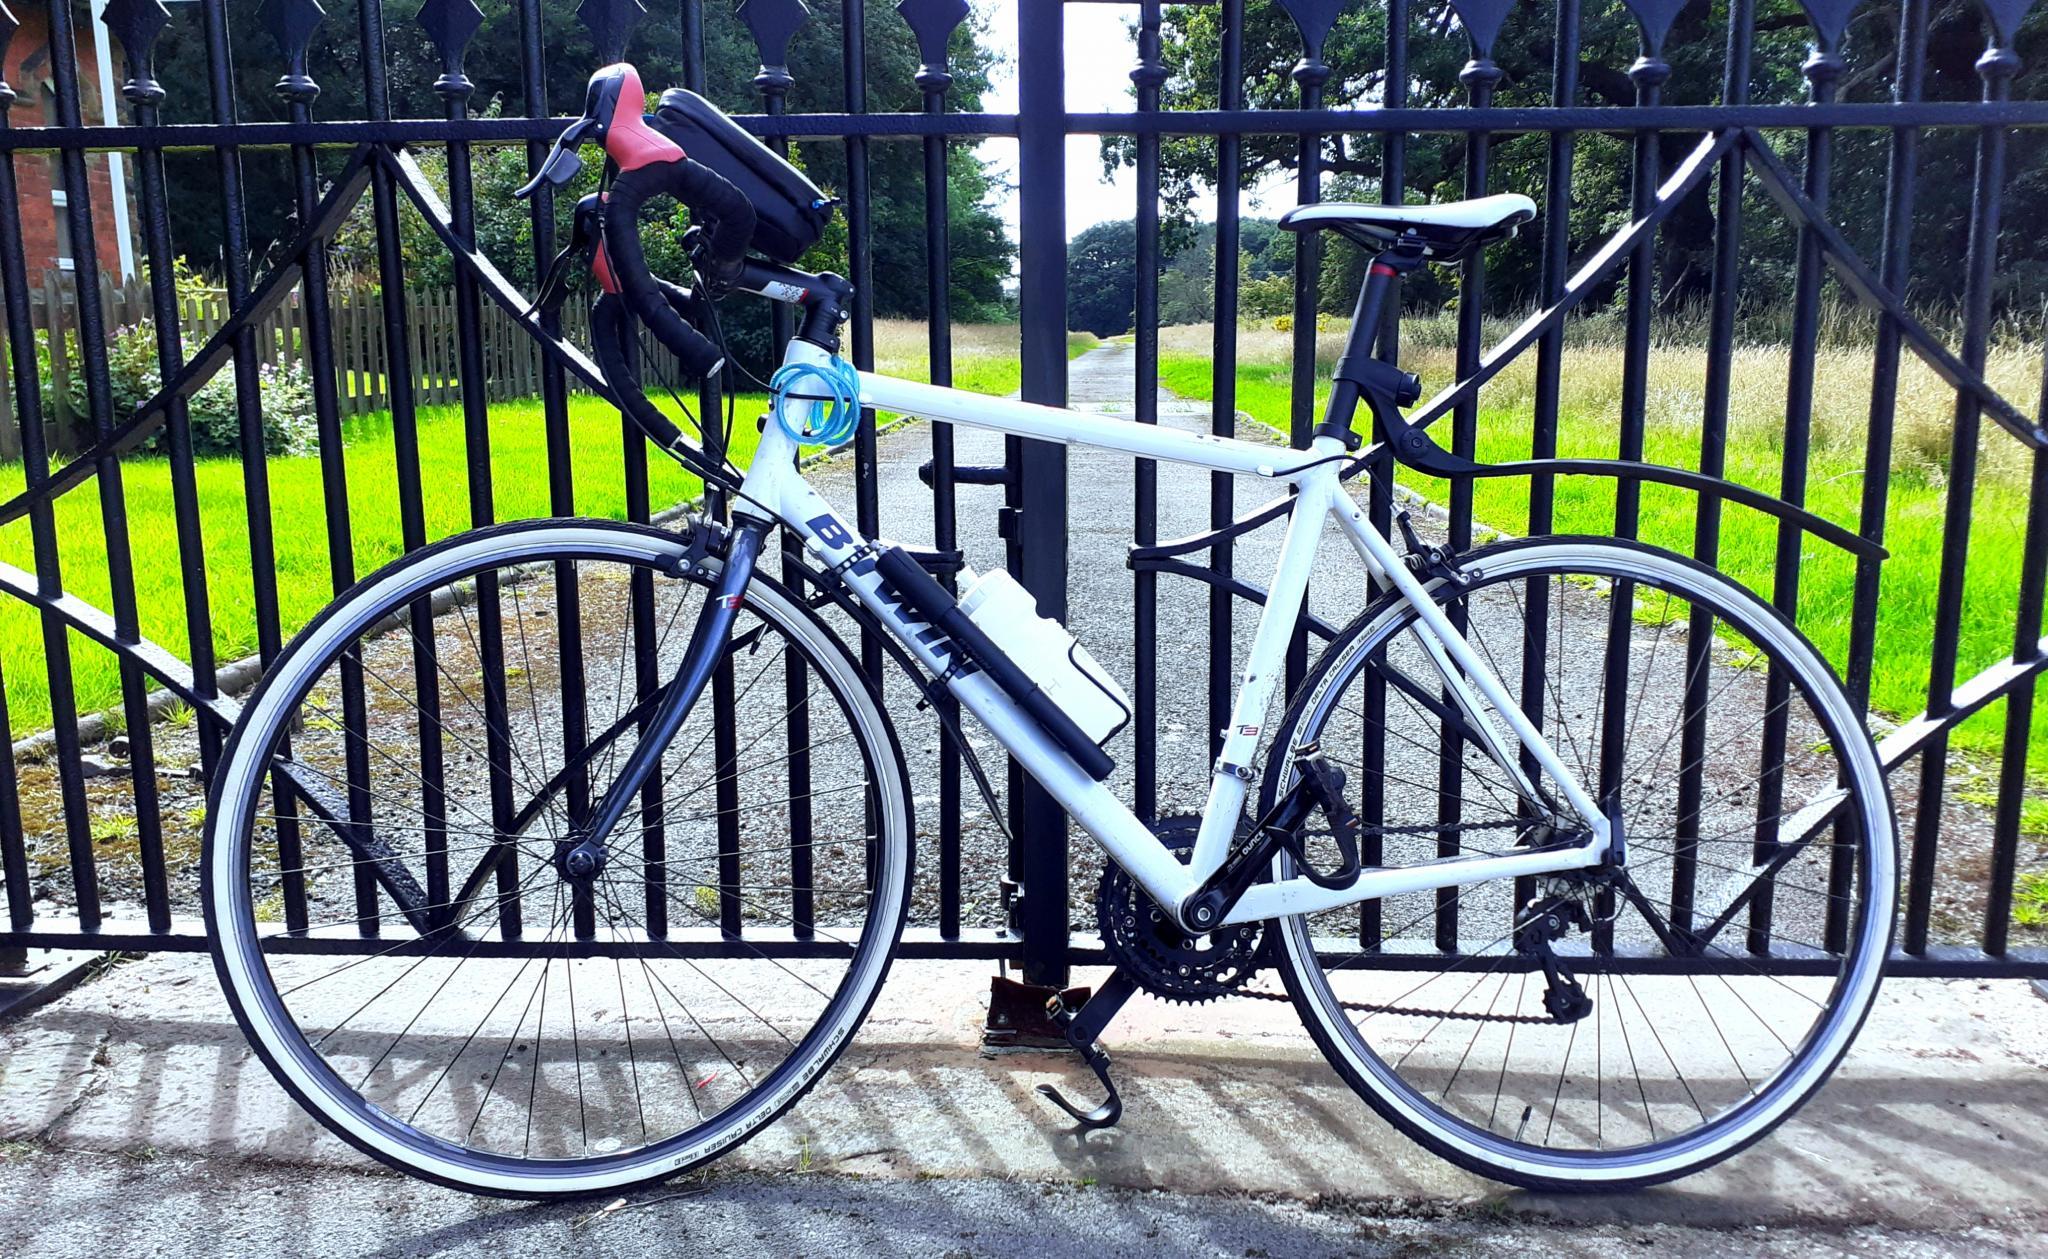 On my bike-20200712_190528-jpg